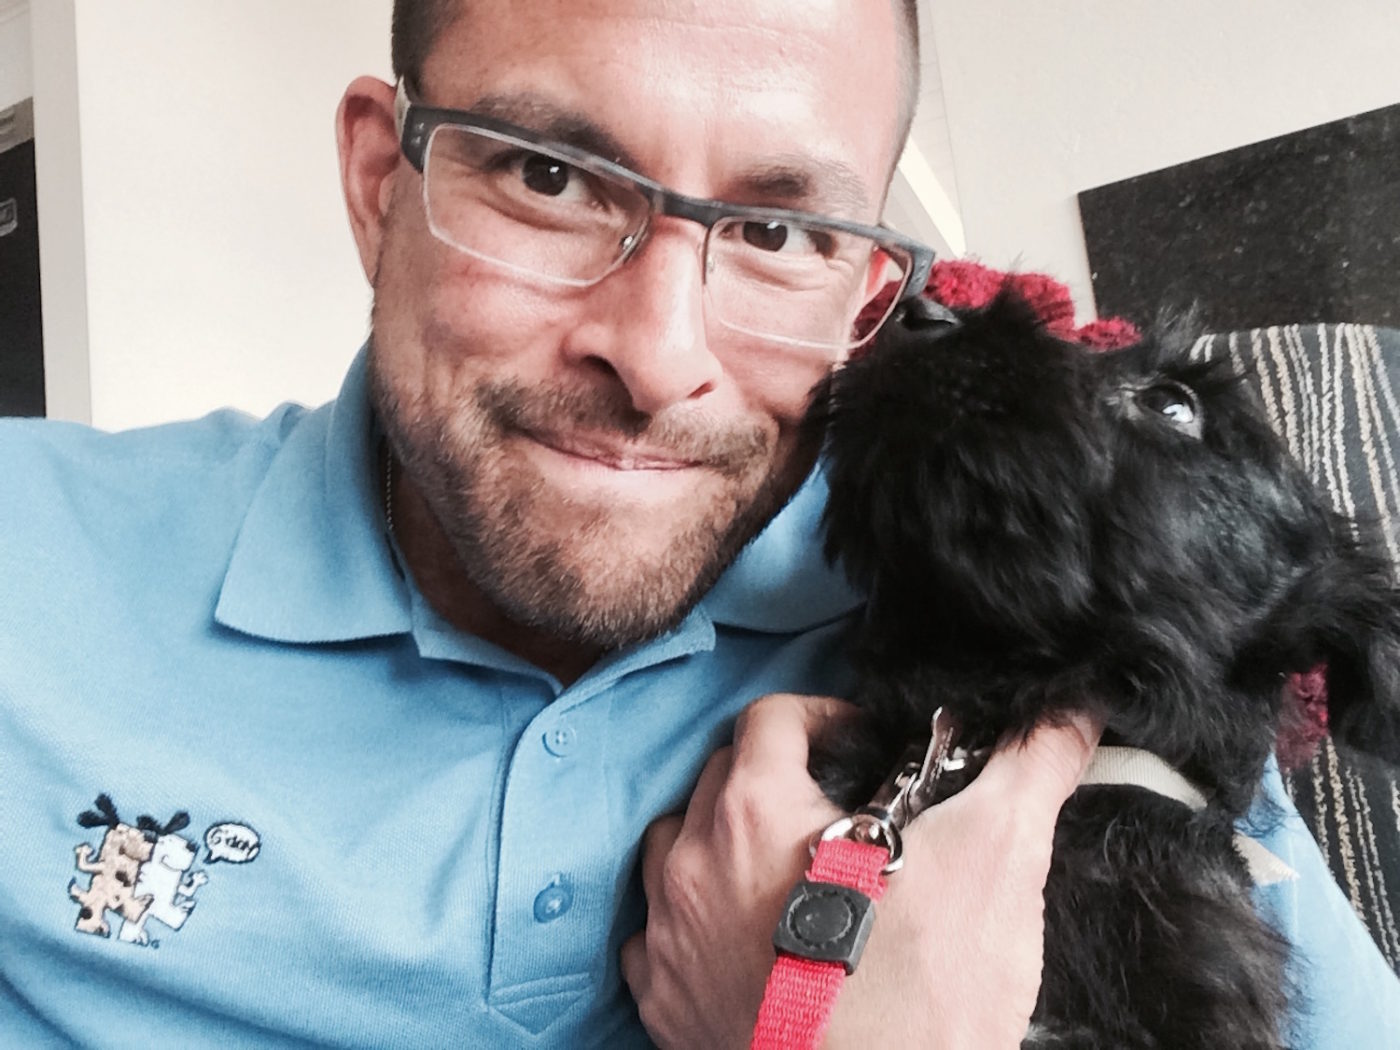 #smalldogsrock, #smalldogtraining, #SanDiegodogtrainer, #dogsofBarkbusters